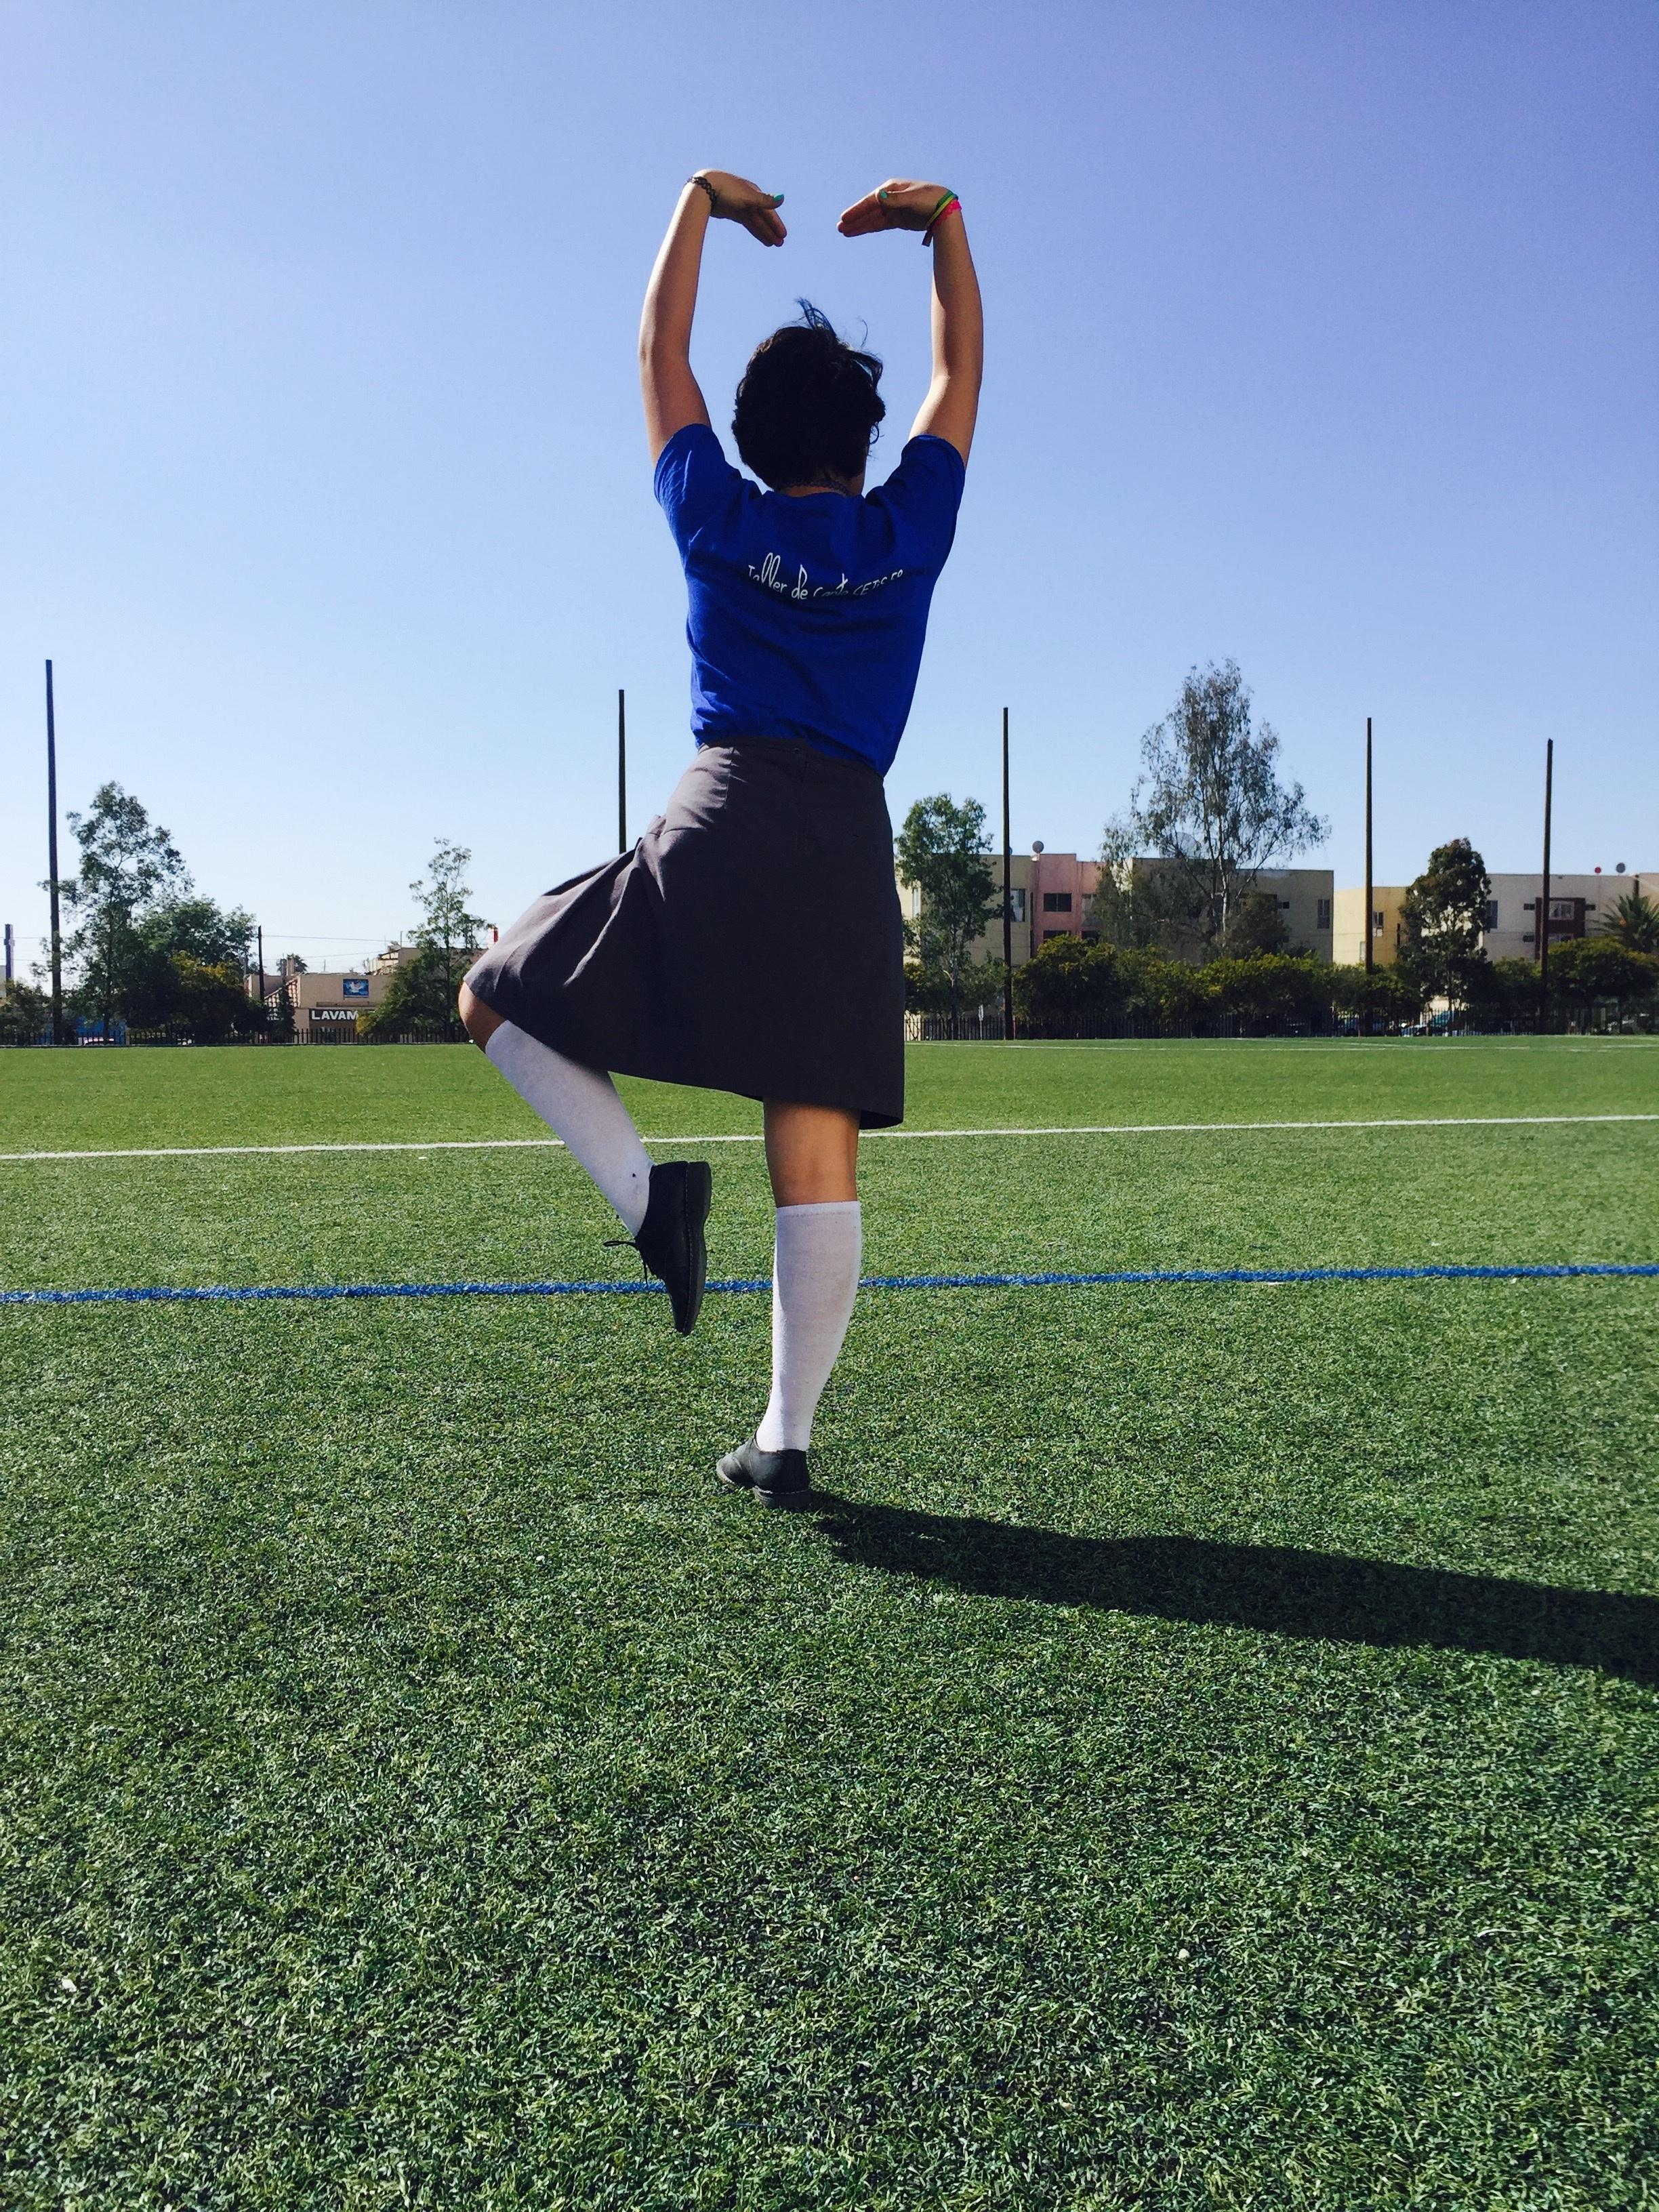 Fotos Gratis Césped Estructura Verde Deportes Pelota